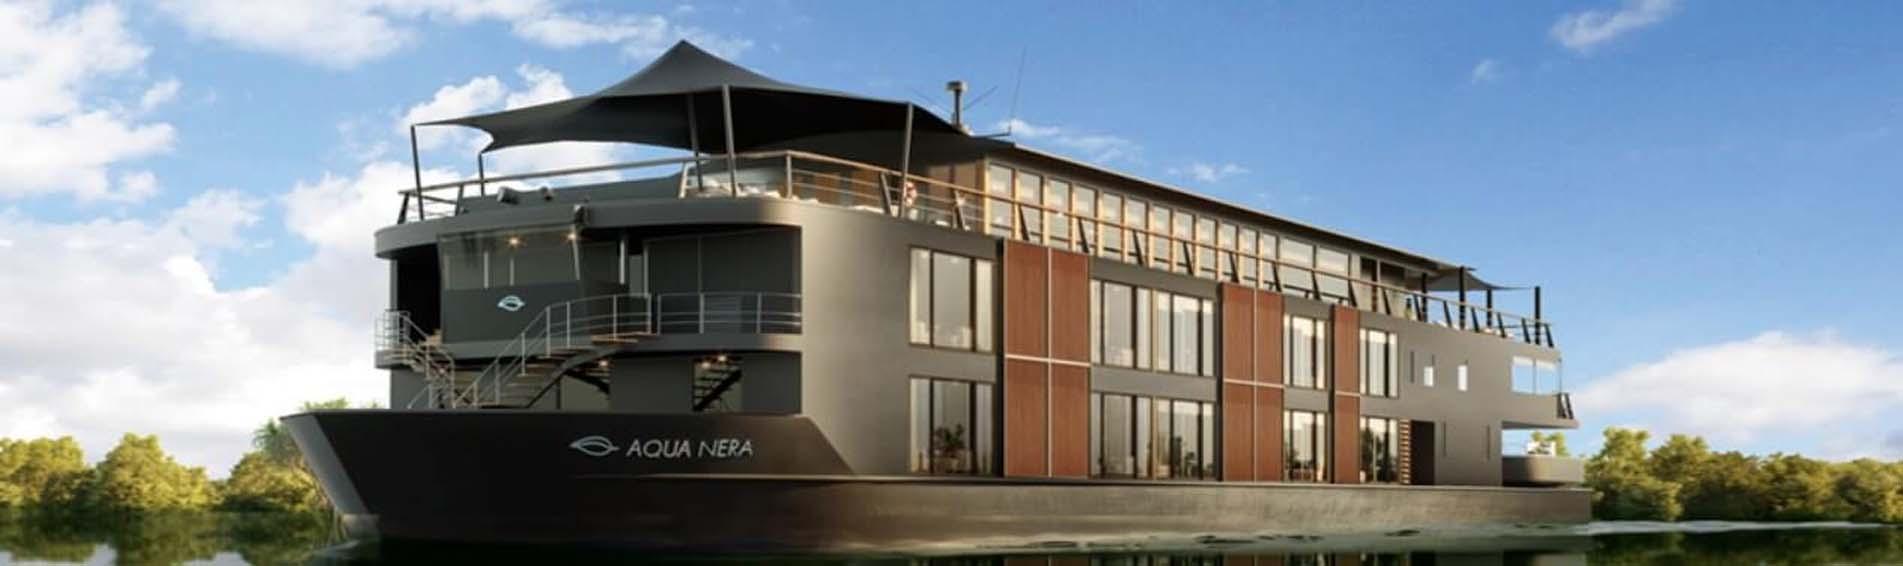 AQUA NERA PERU AMAZON CRUISE side profile ship